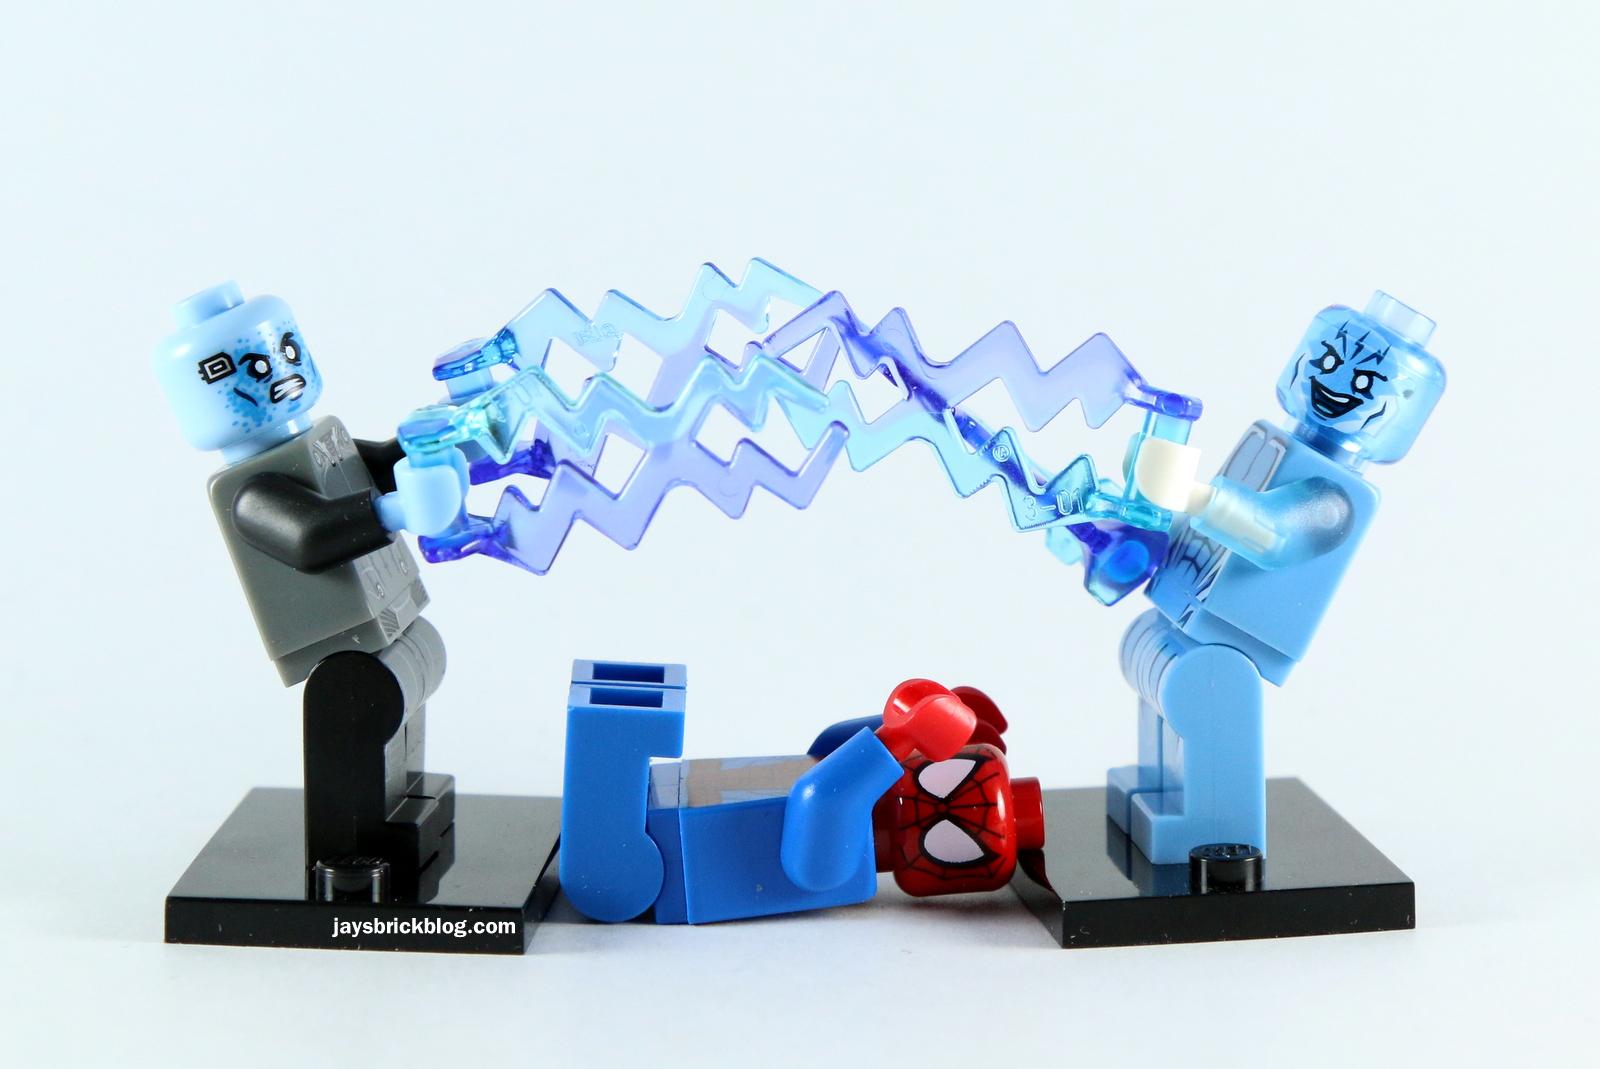 Lego ultimate spider man electro - photo#12